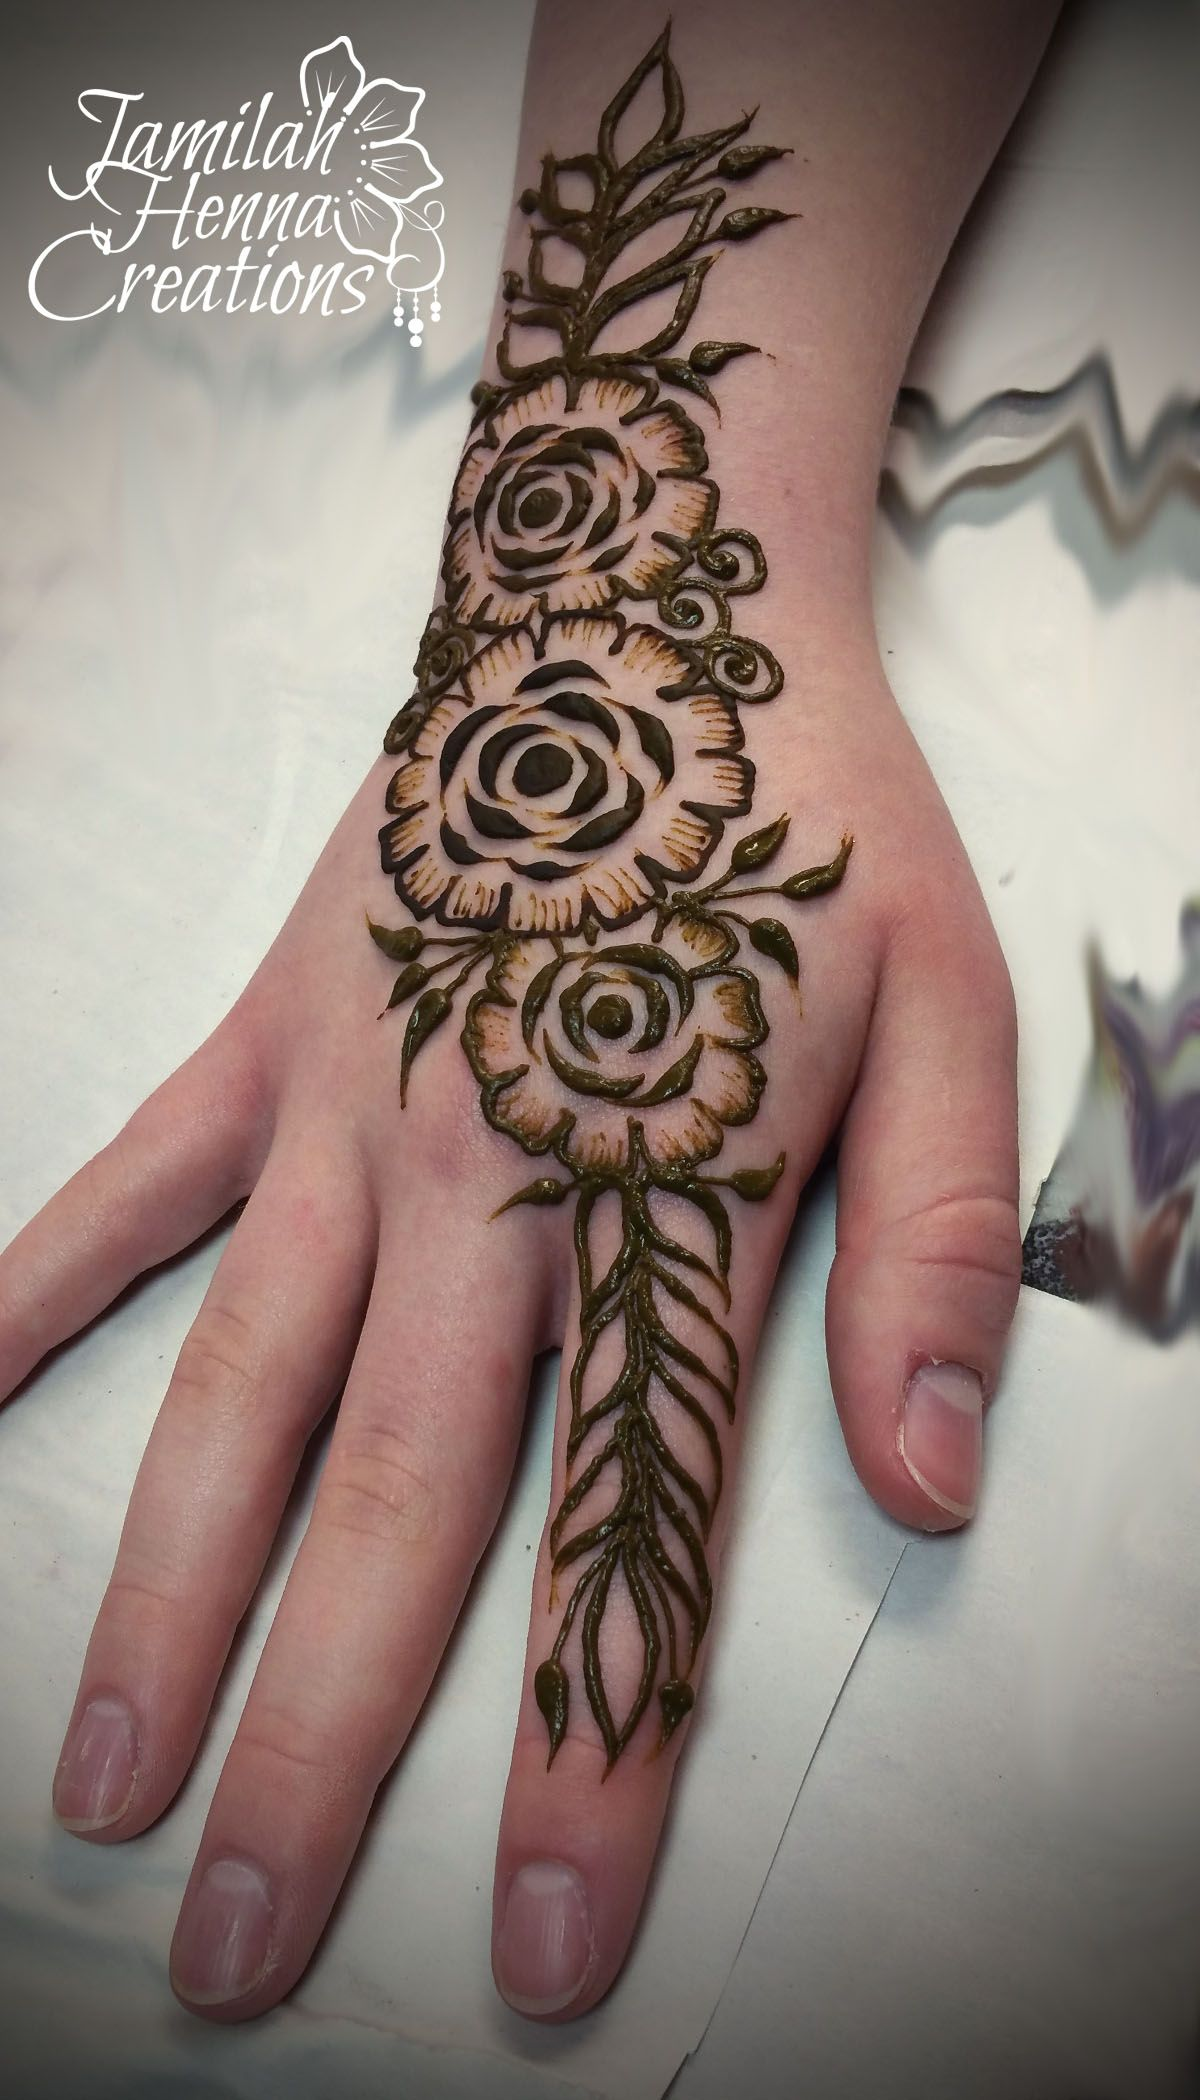 Gulf Rose Henna Www Jamilahhennacreations Com Henna Flower Designs Simple Henna Flower Henna